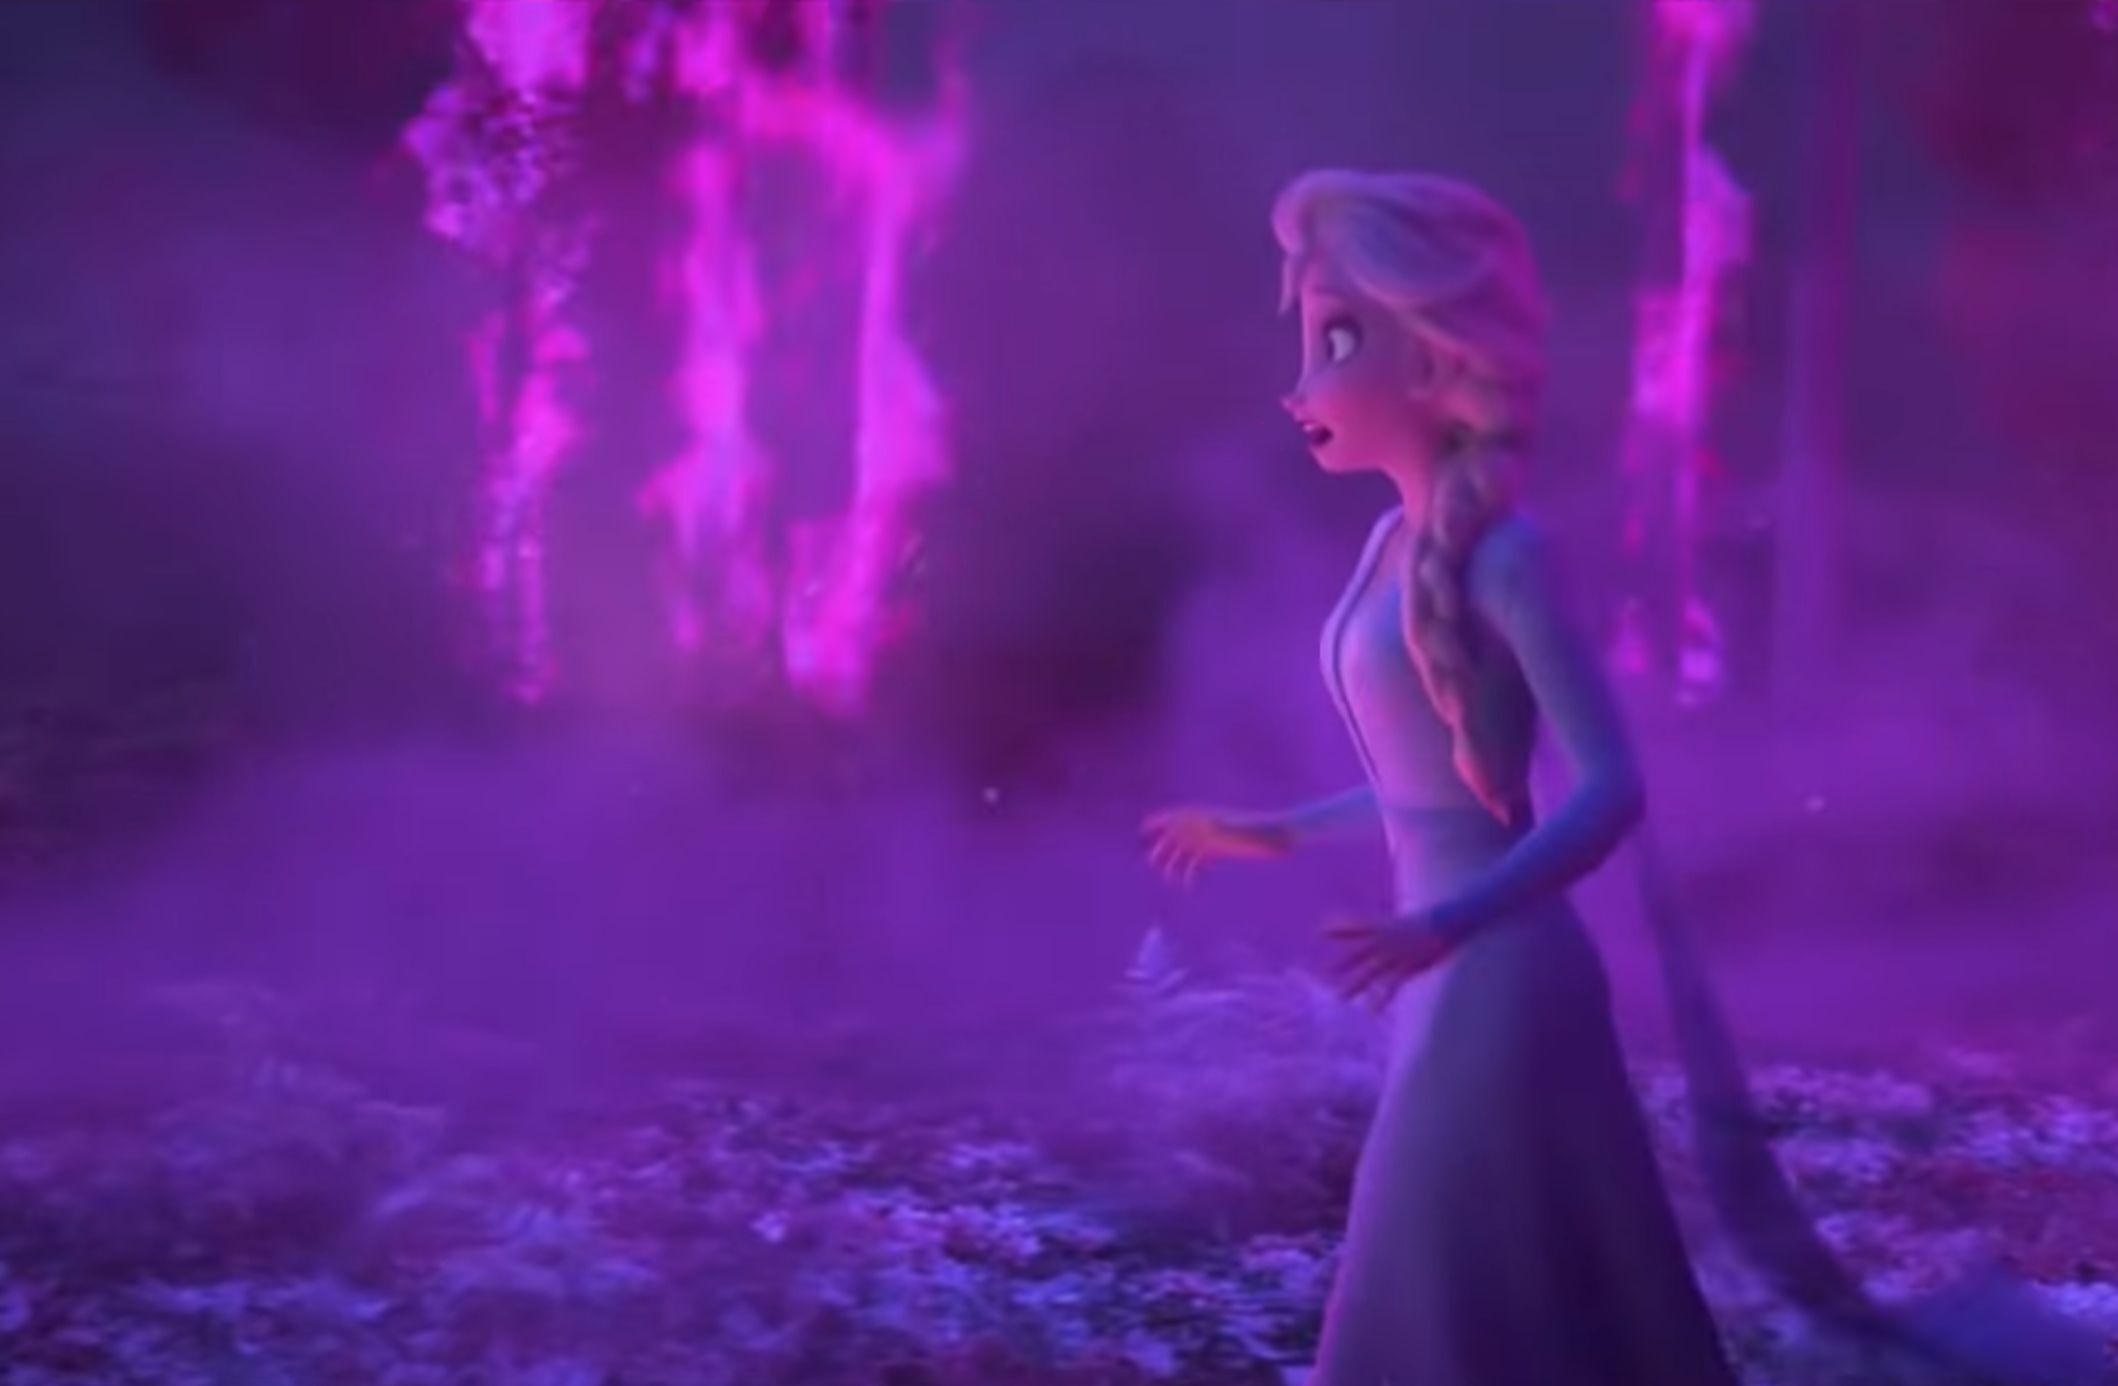 Frozen 2 goes full epic fantasy in new trailer